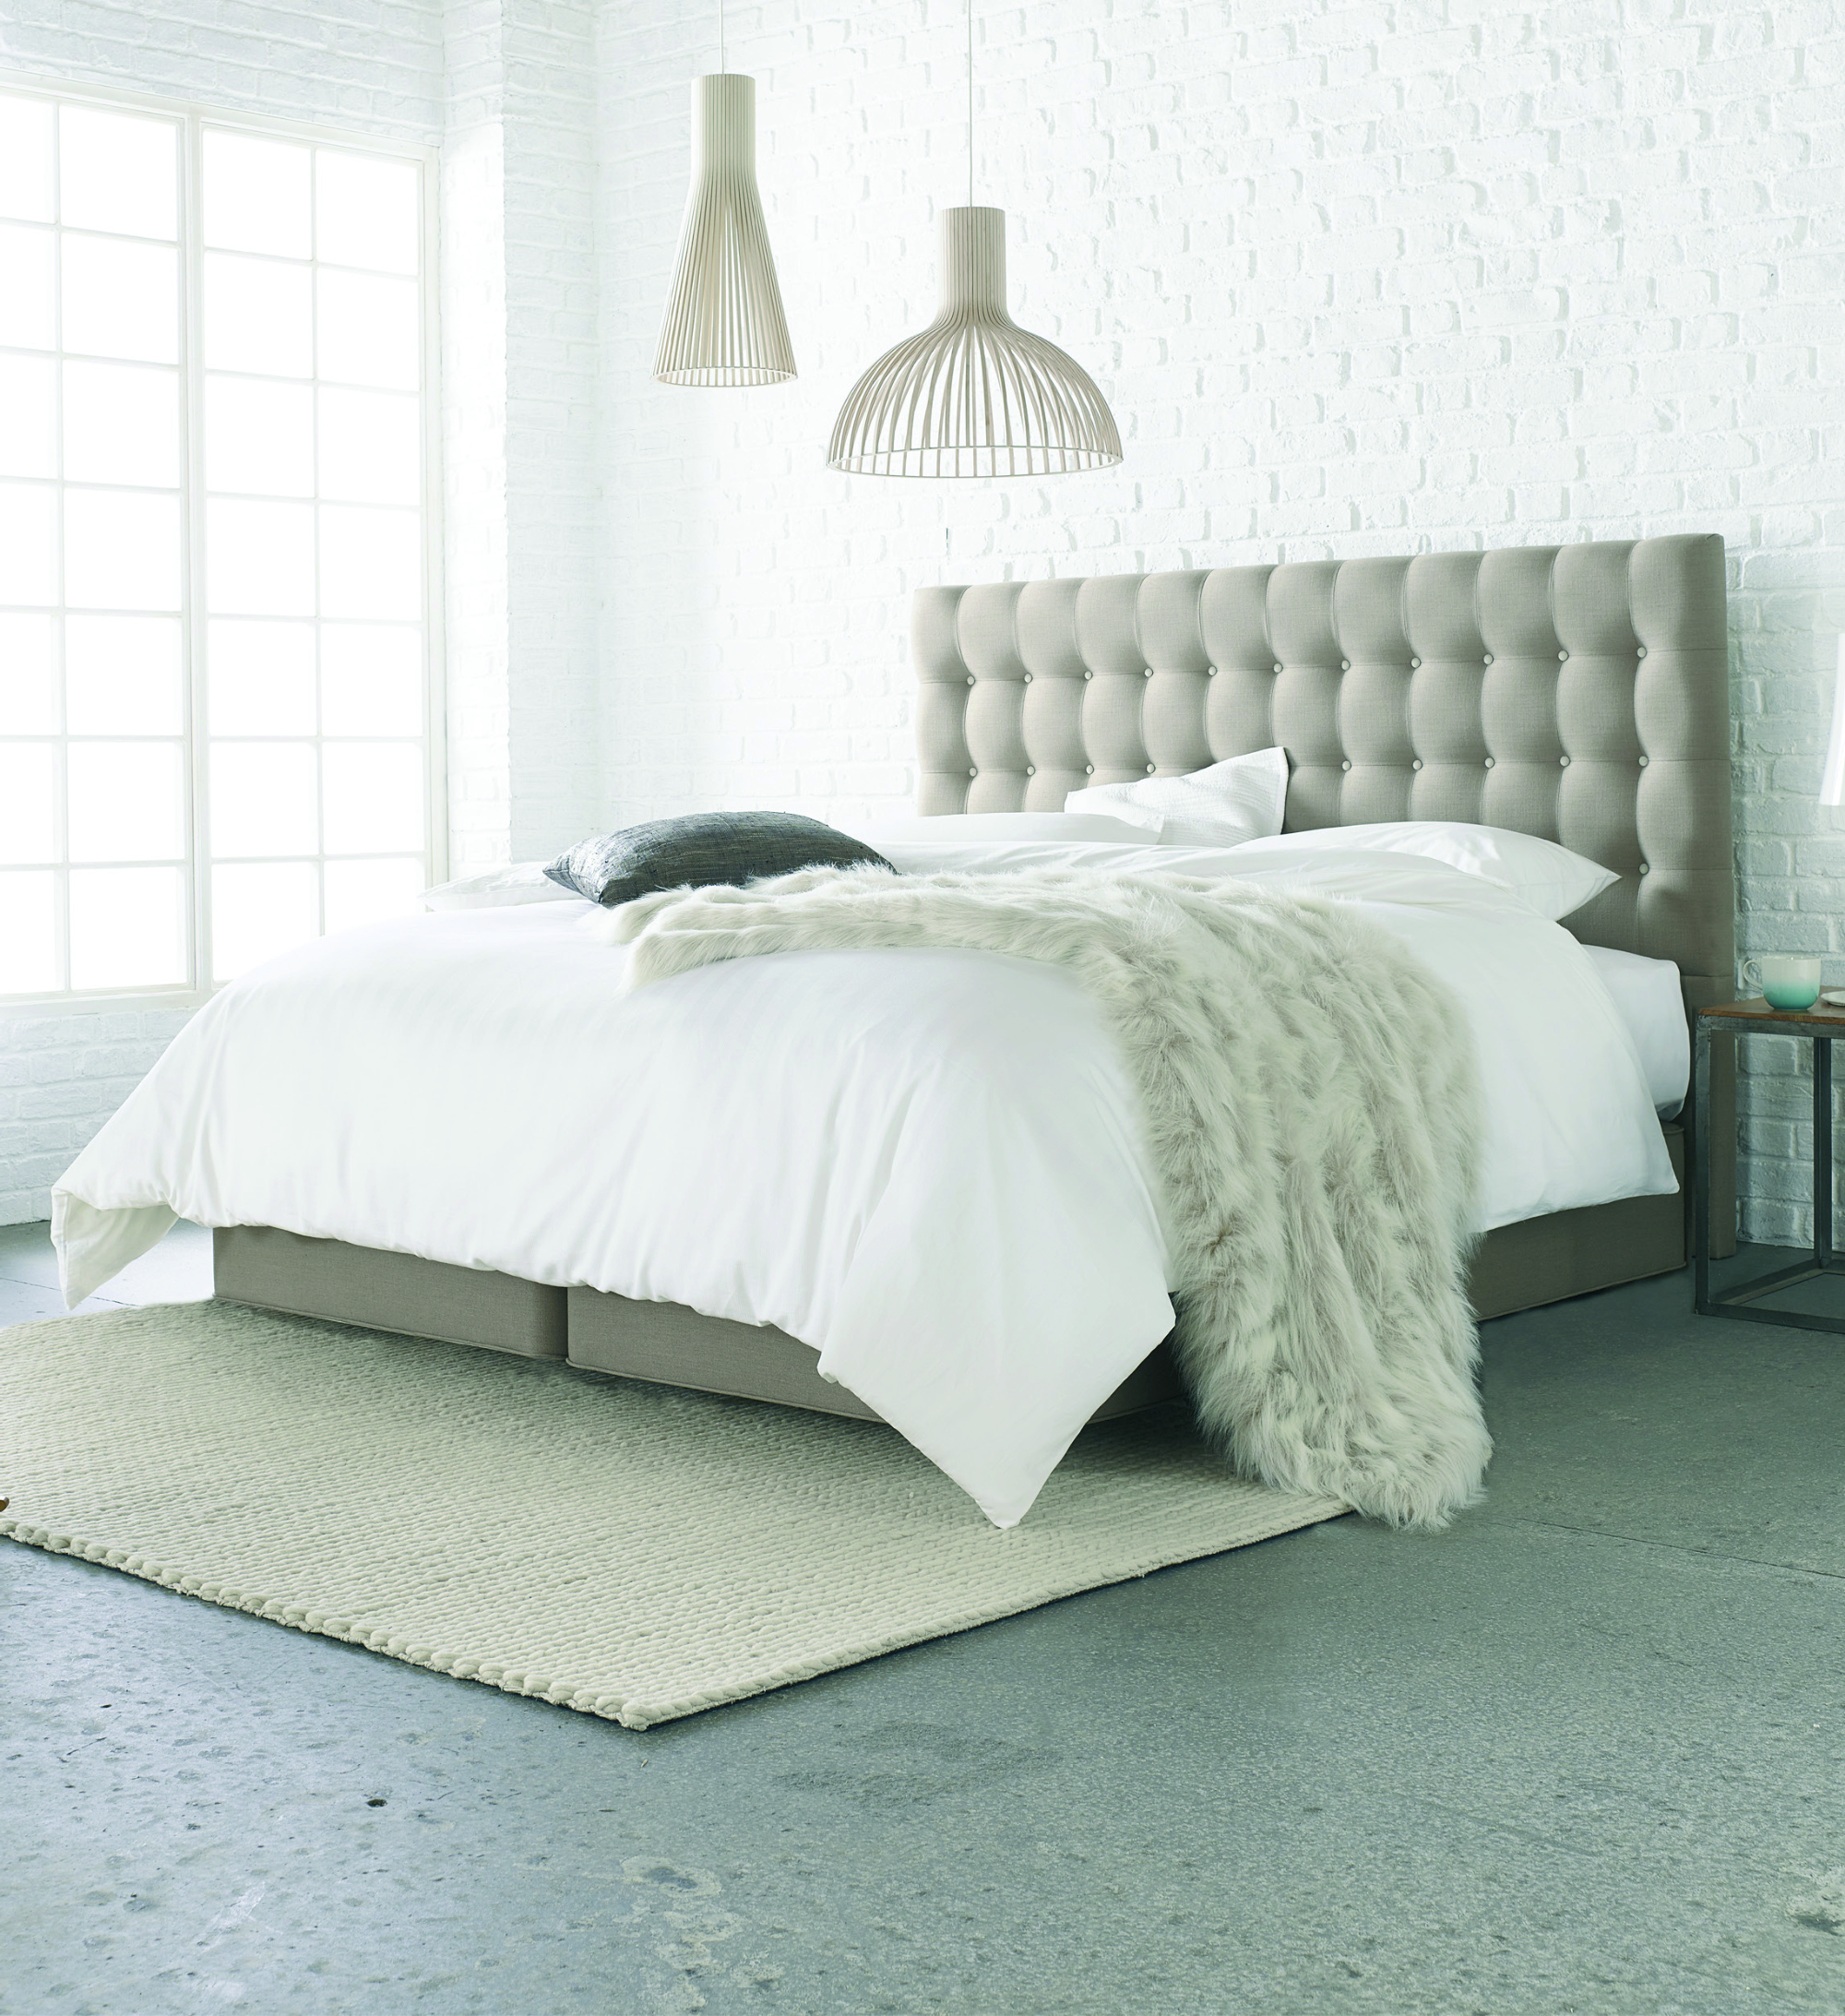 Somnus adjustable Bed 2